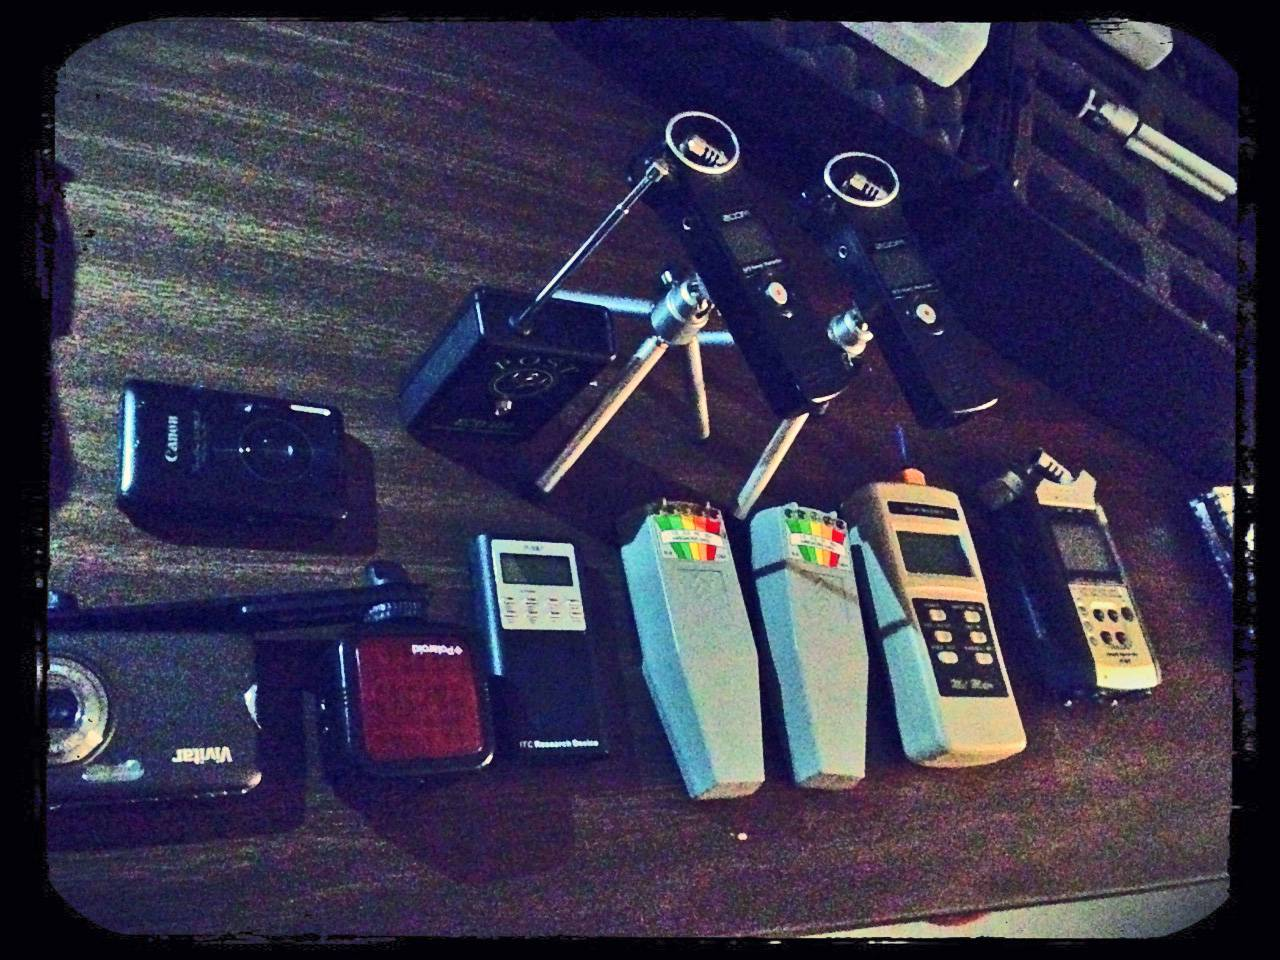 A small spread of gear